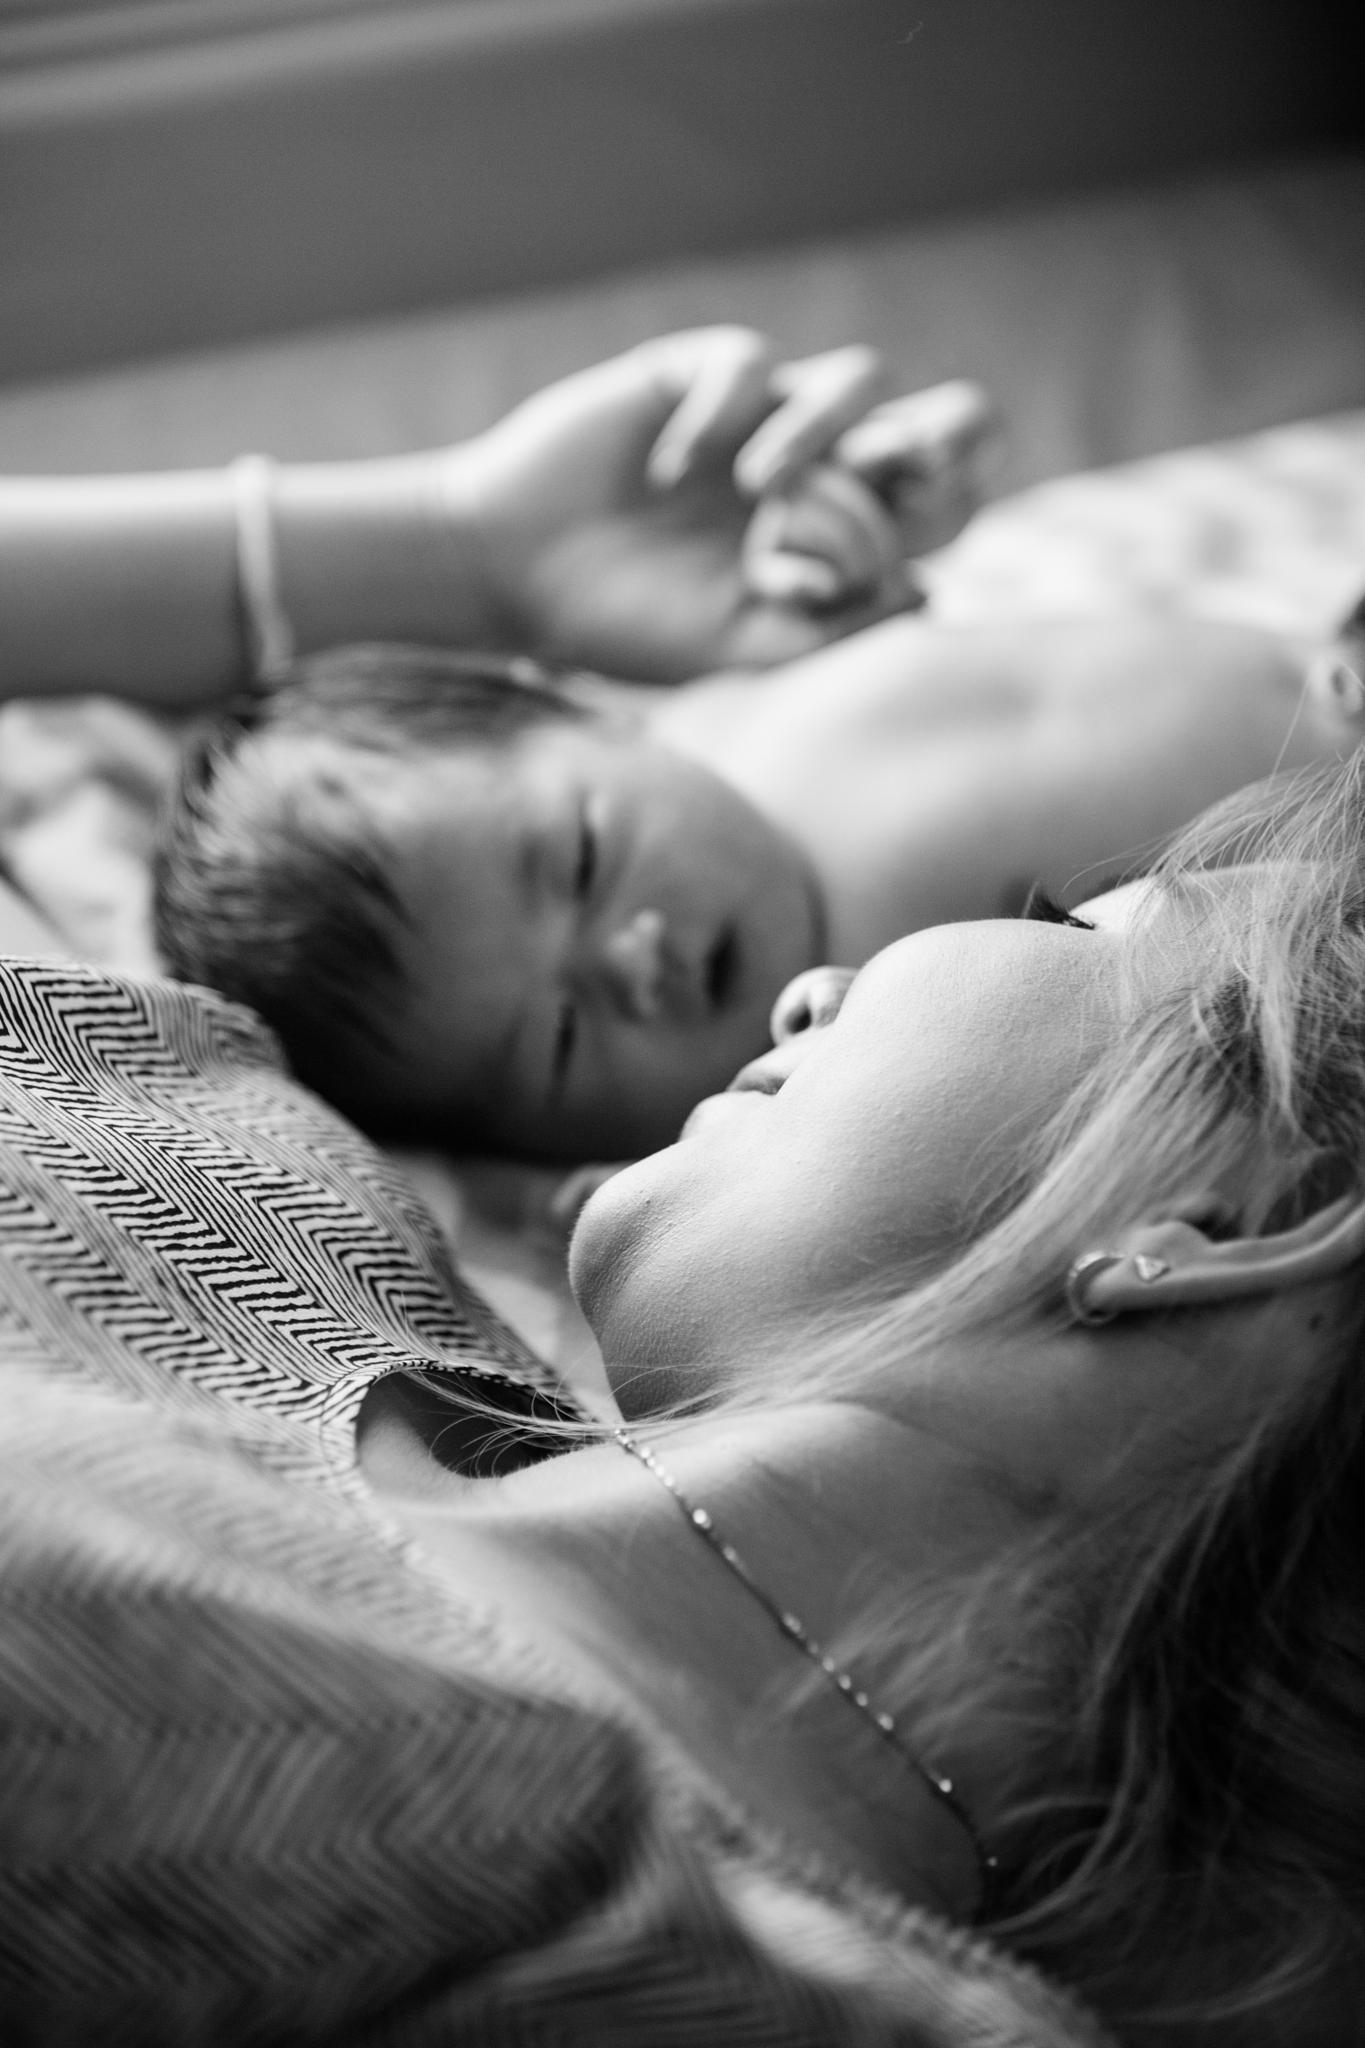 Mother & Daughter Bonding by ilenemao26